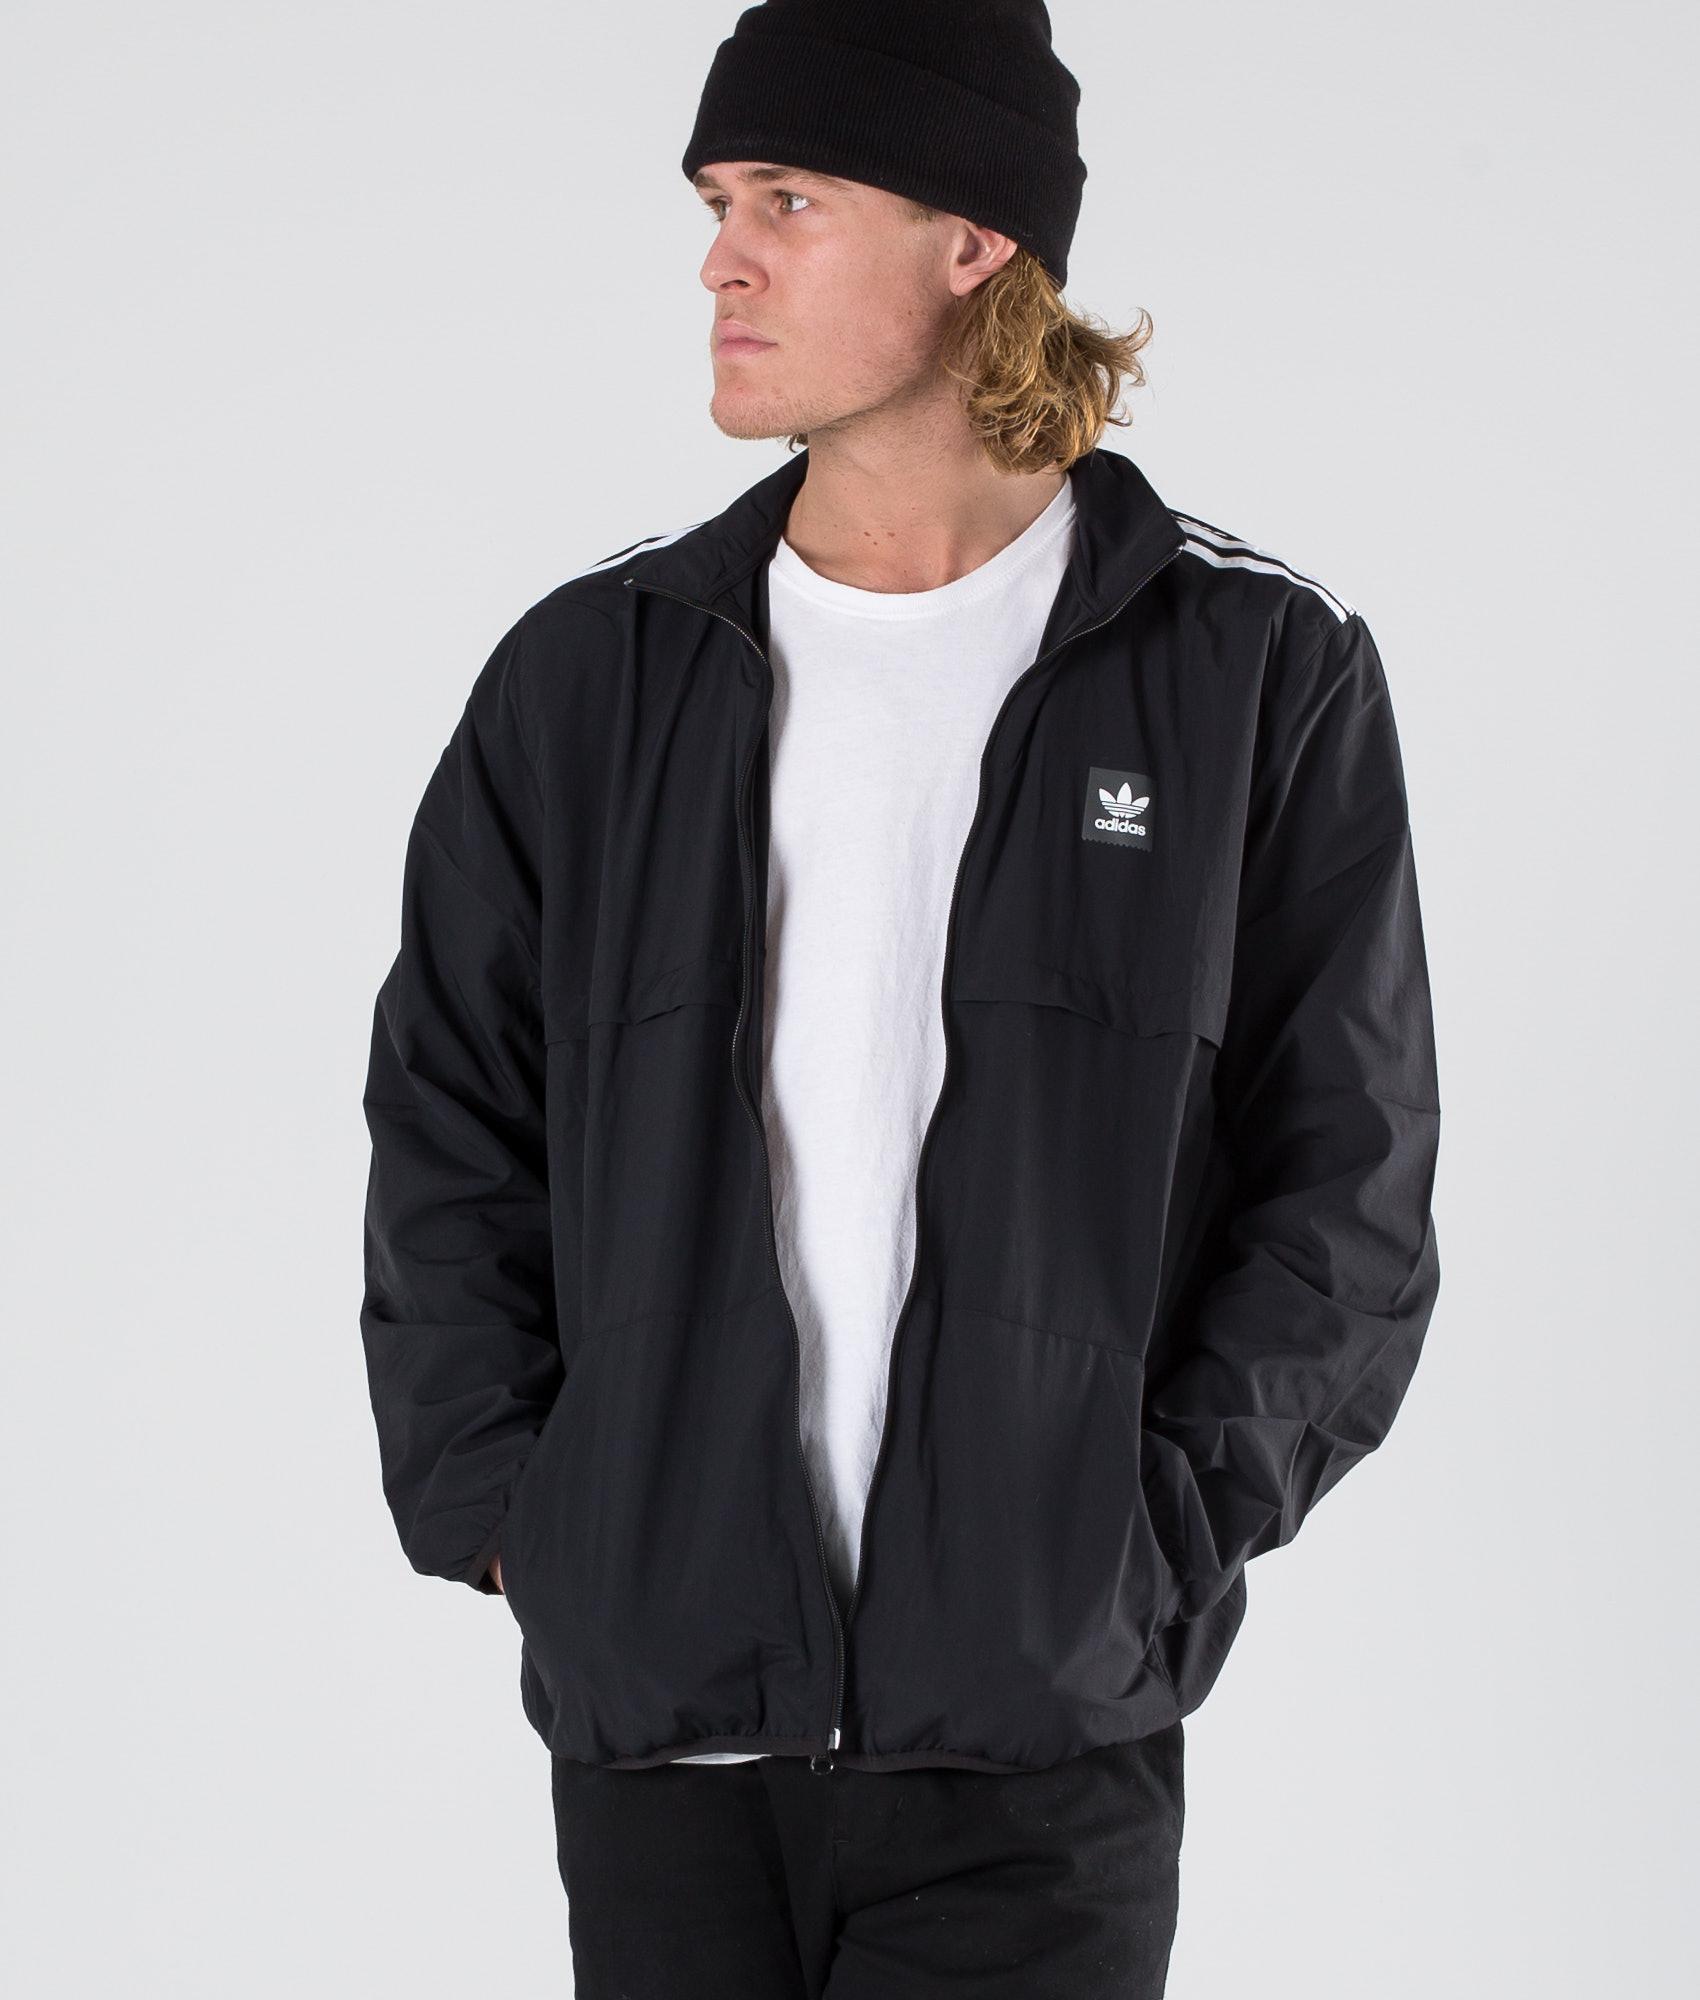 da980ab1 Men's Streetwear Jackets | Free Delivery | RIDESTORE